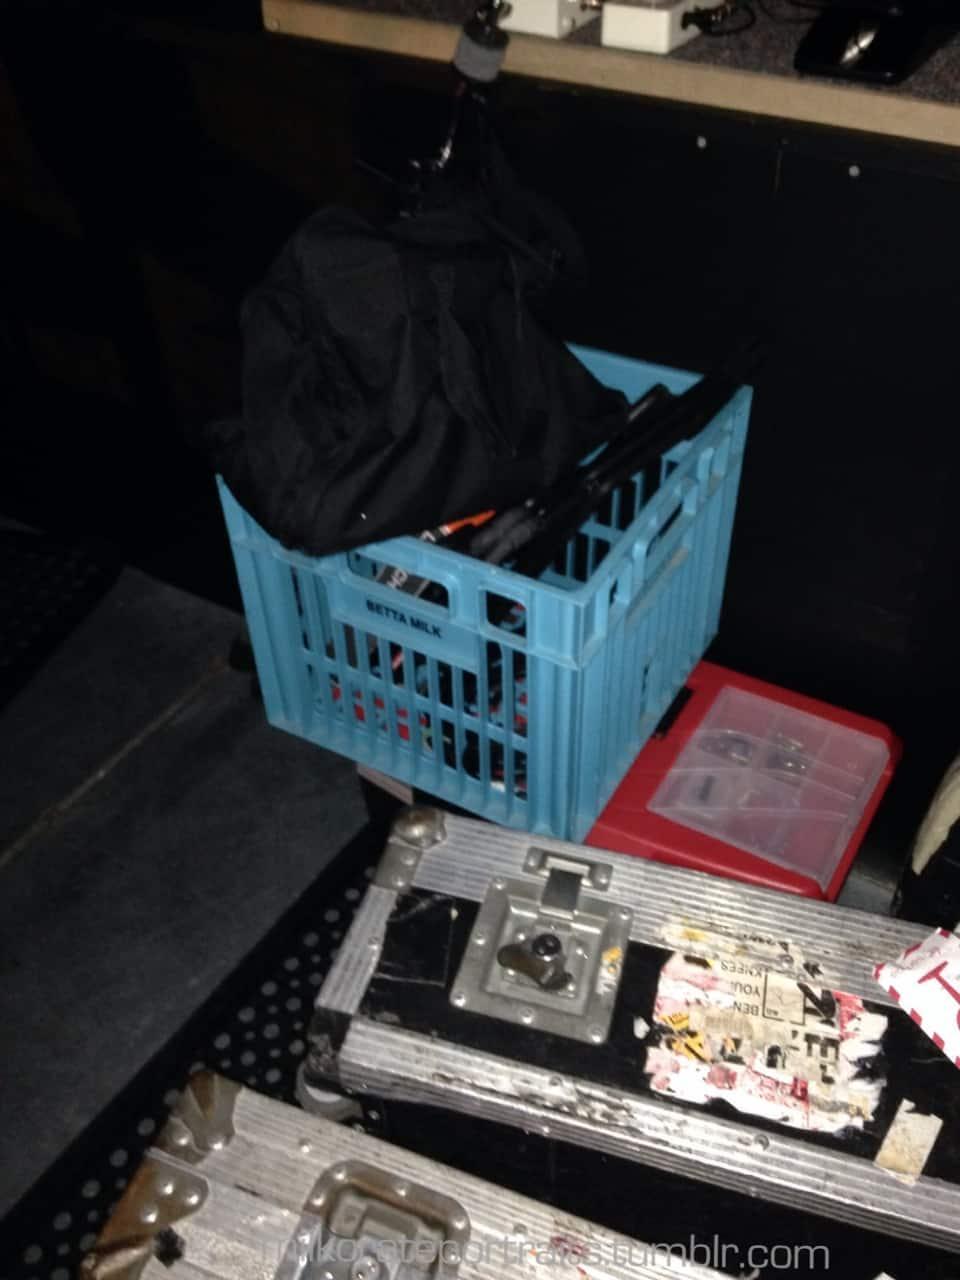 Backstage milk crate